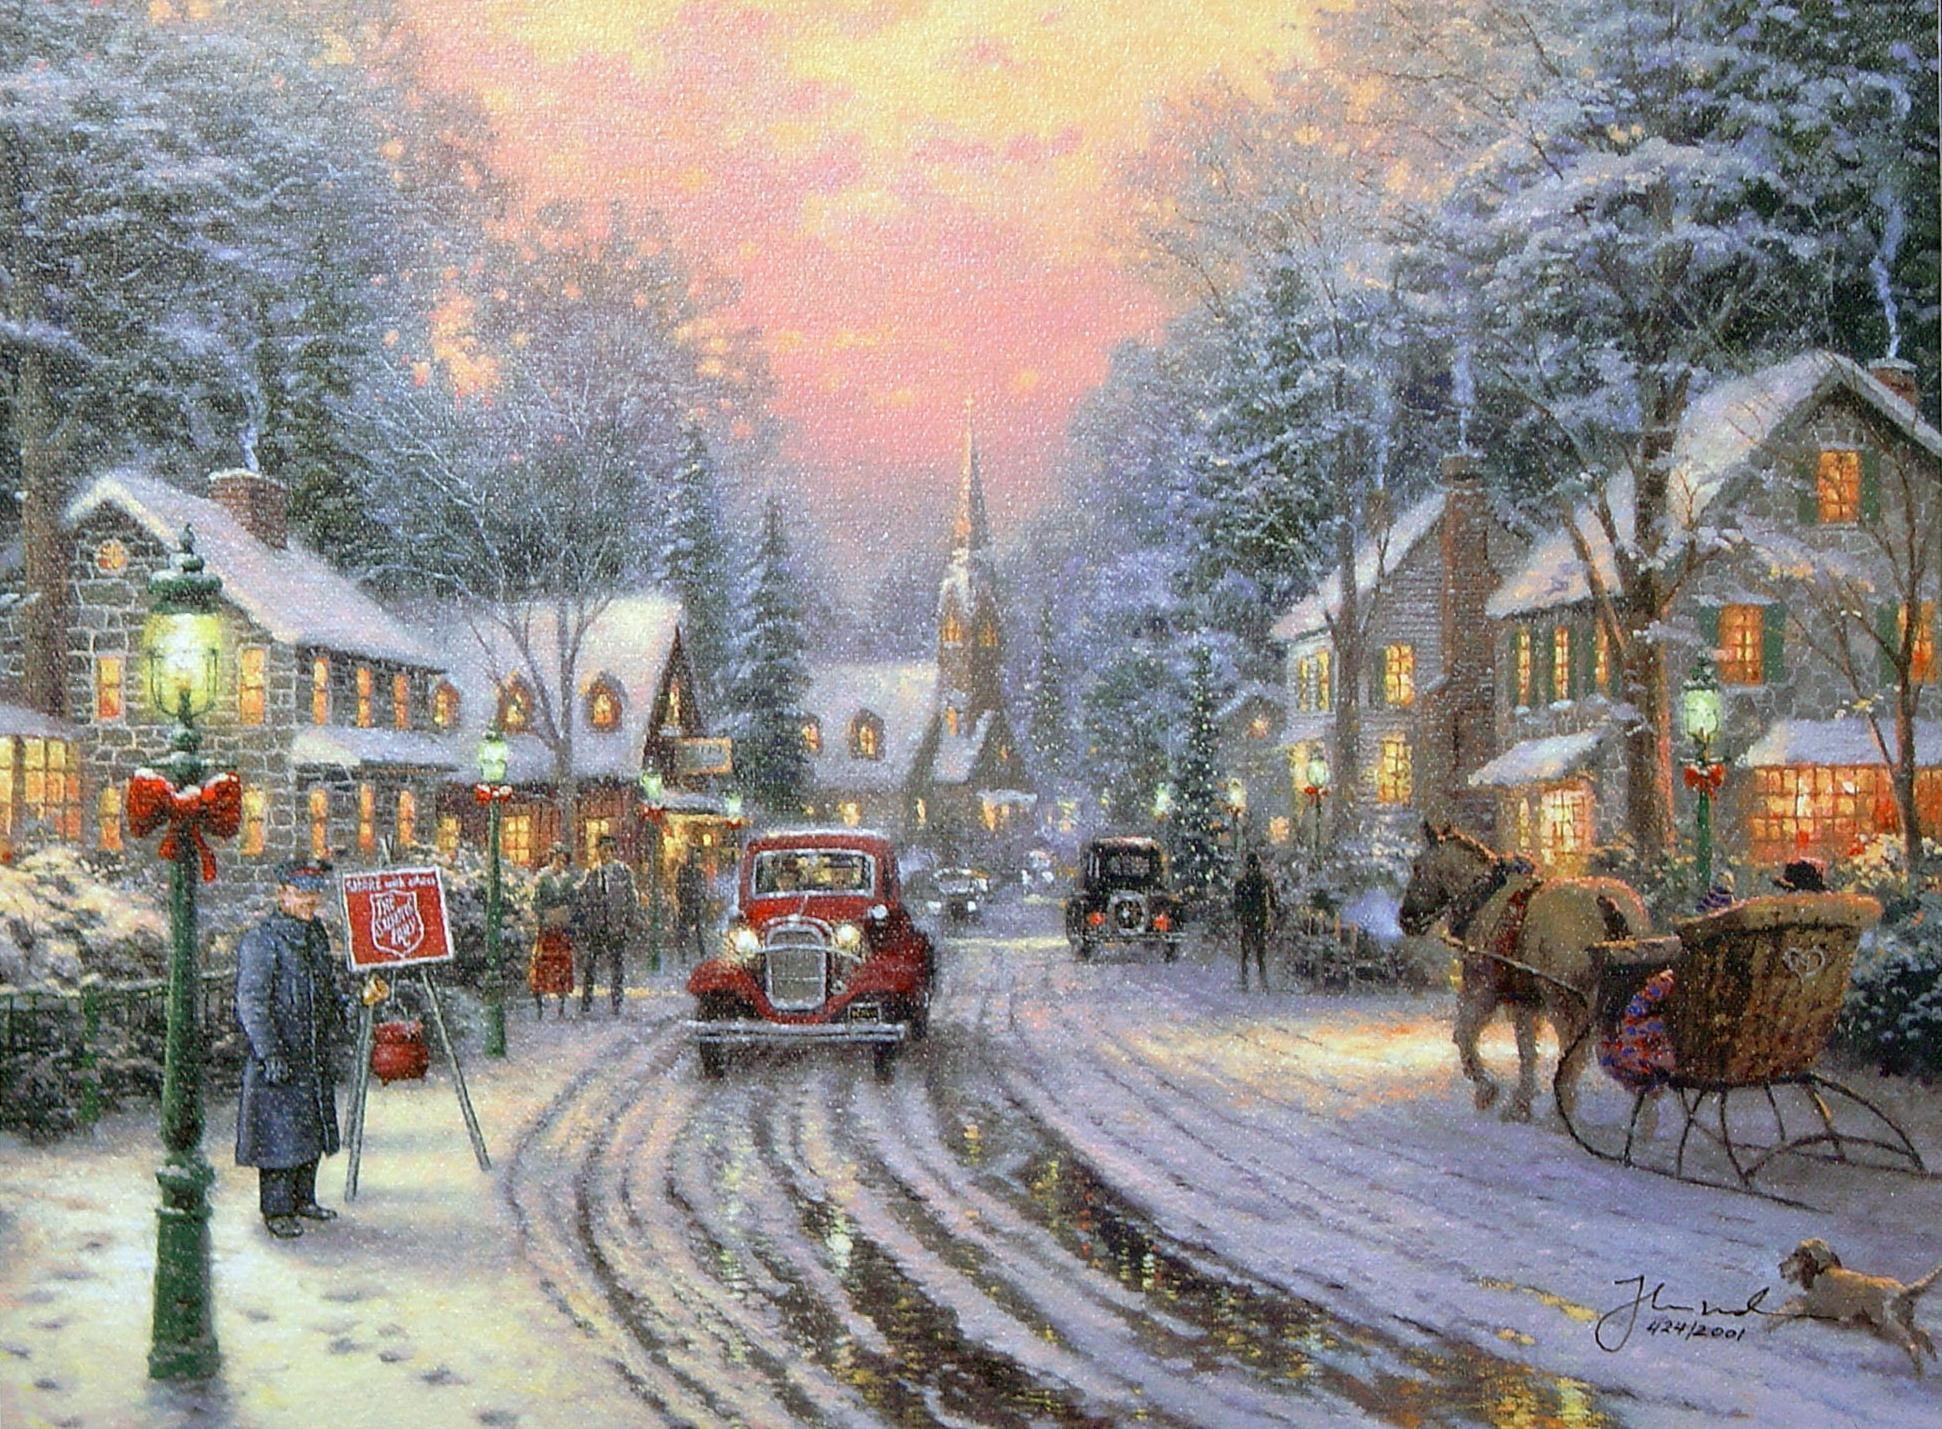 Thomas Kinkade Nativity Wallpapers Top Free Thomas Kinkade Nativity Backgrounds Wallpaperaccess